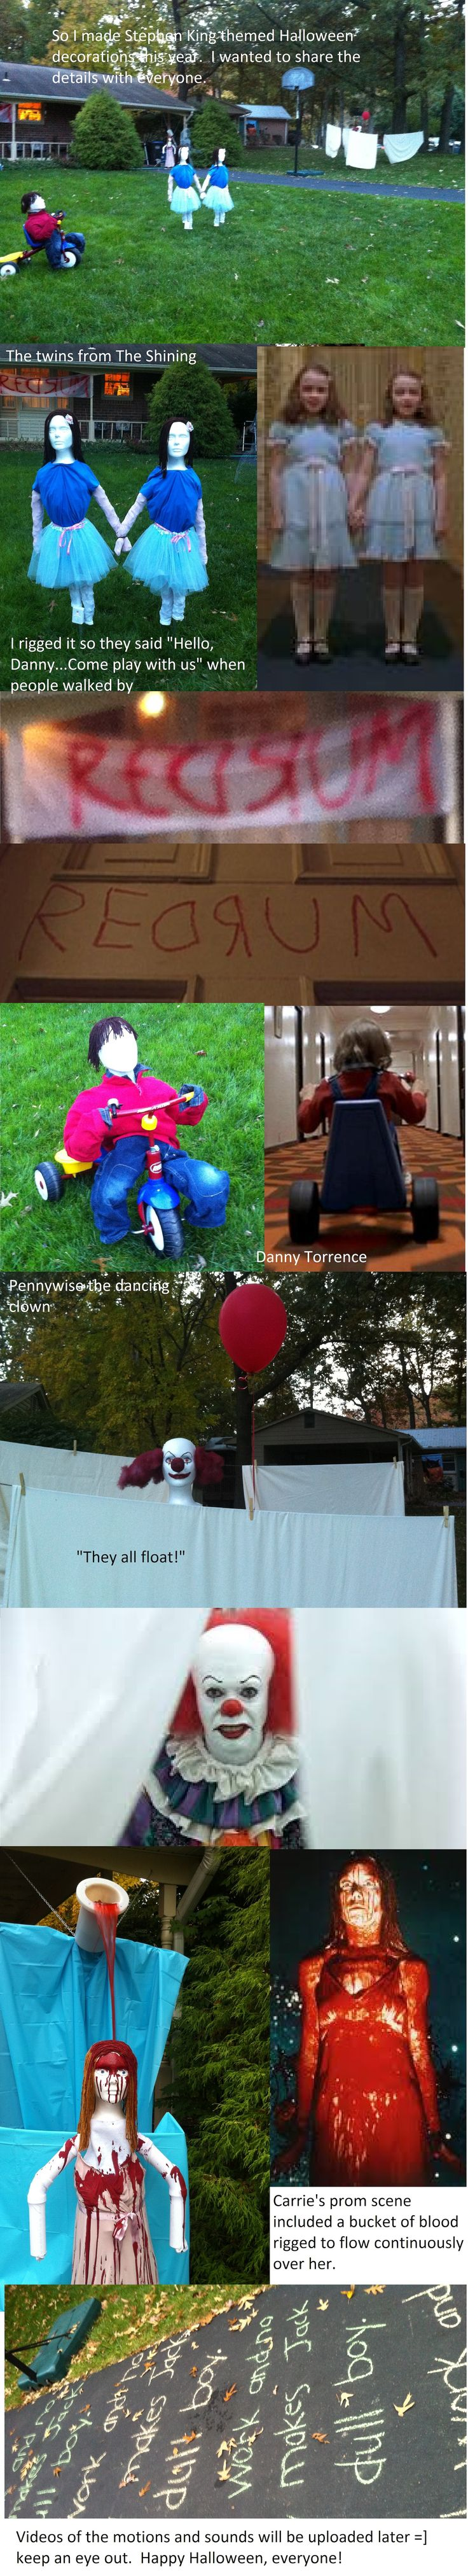 My Stephen King themed Halloween display